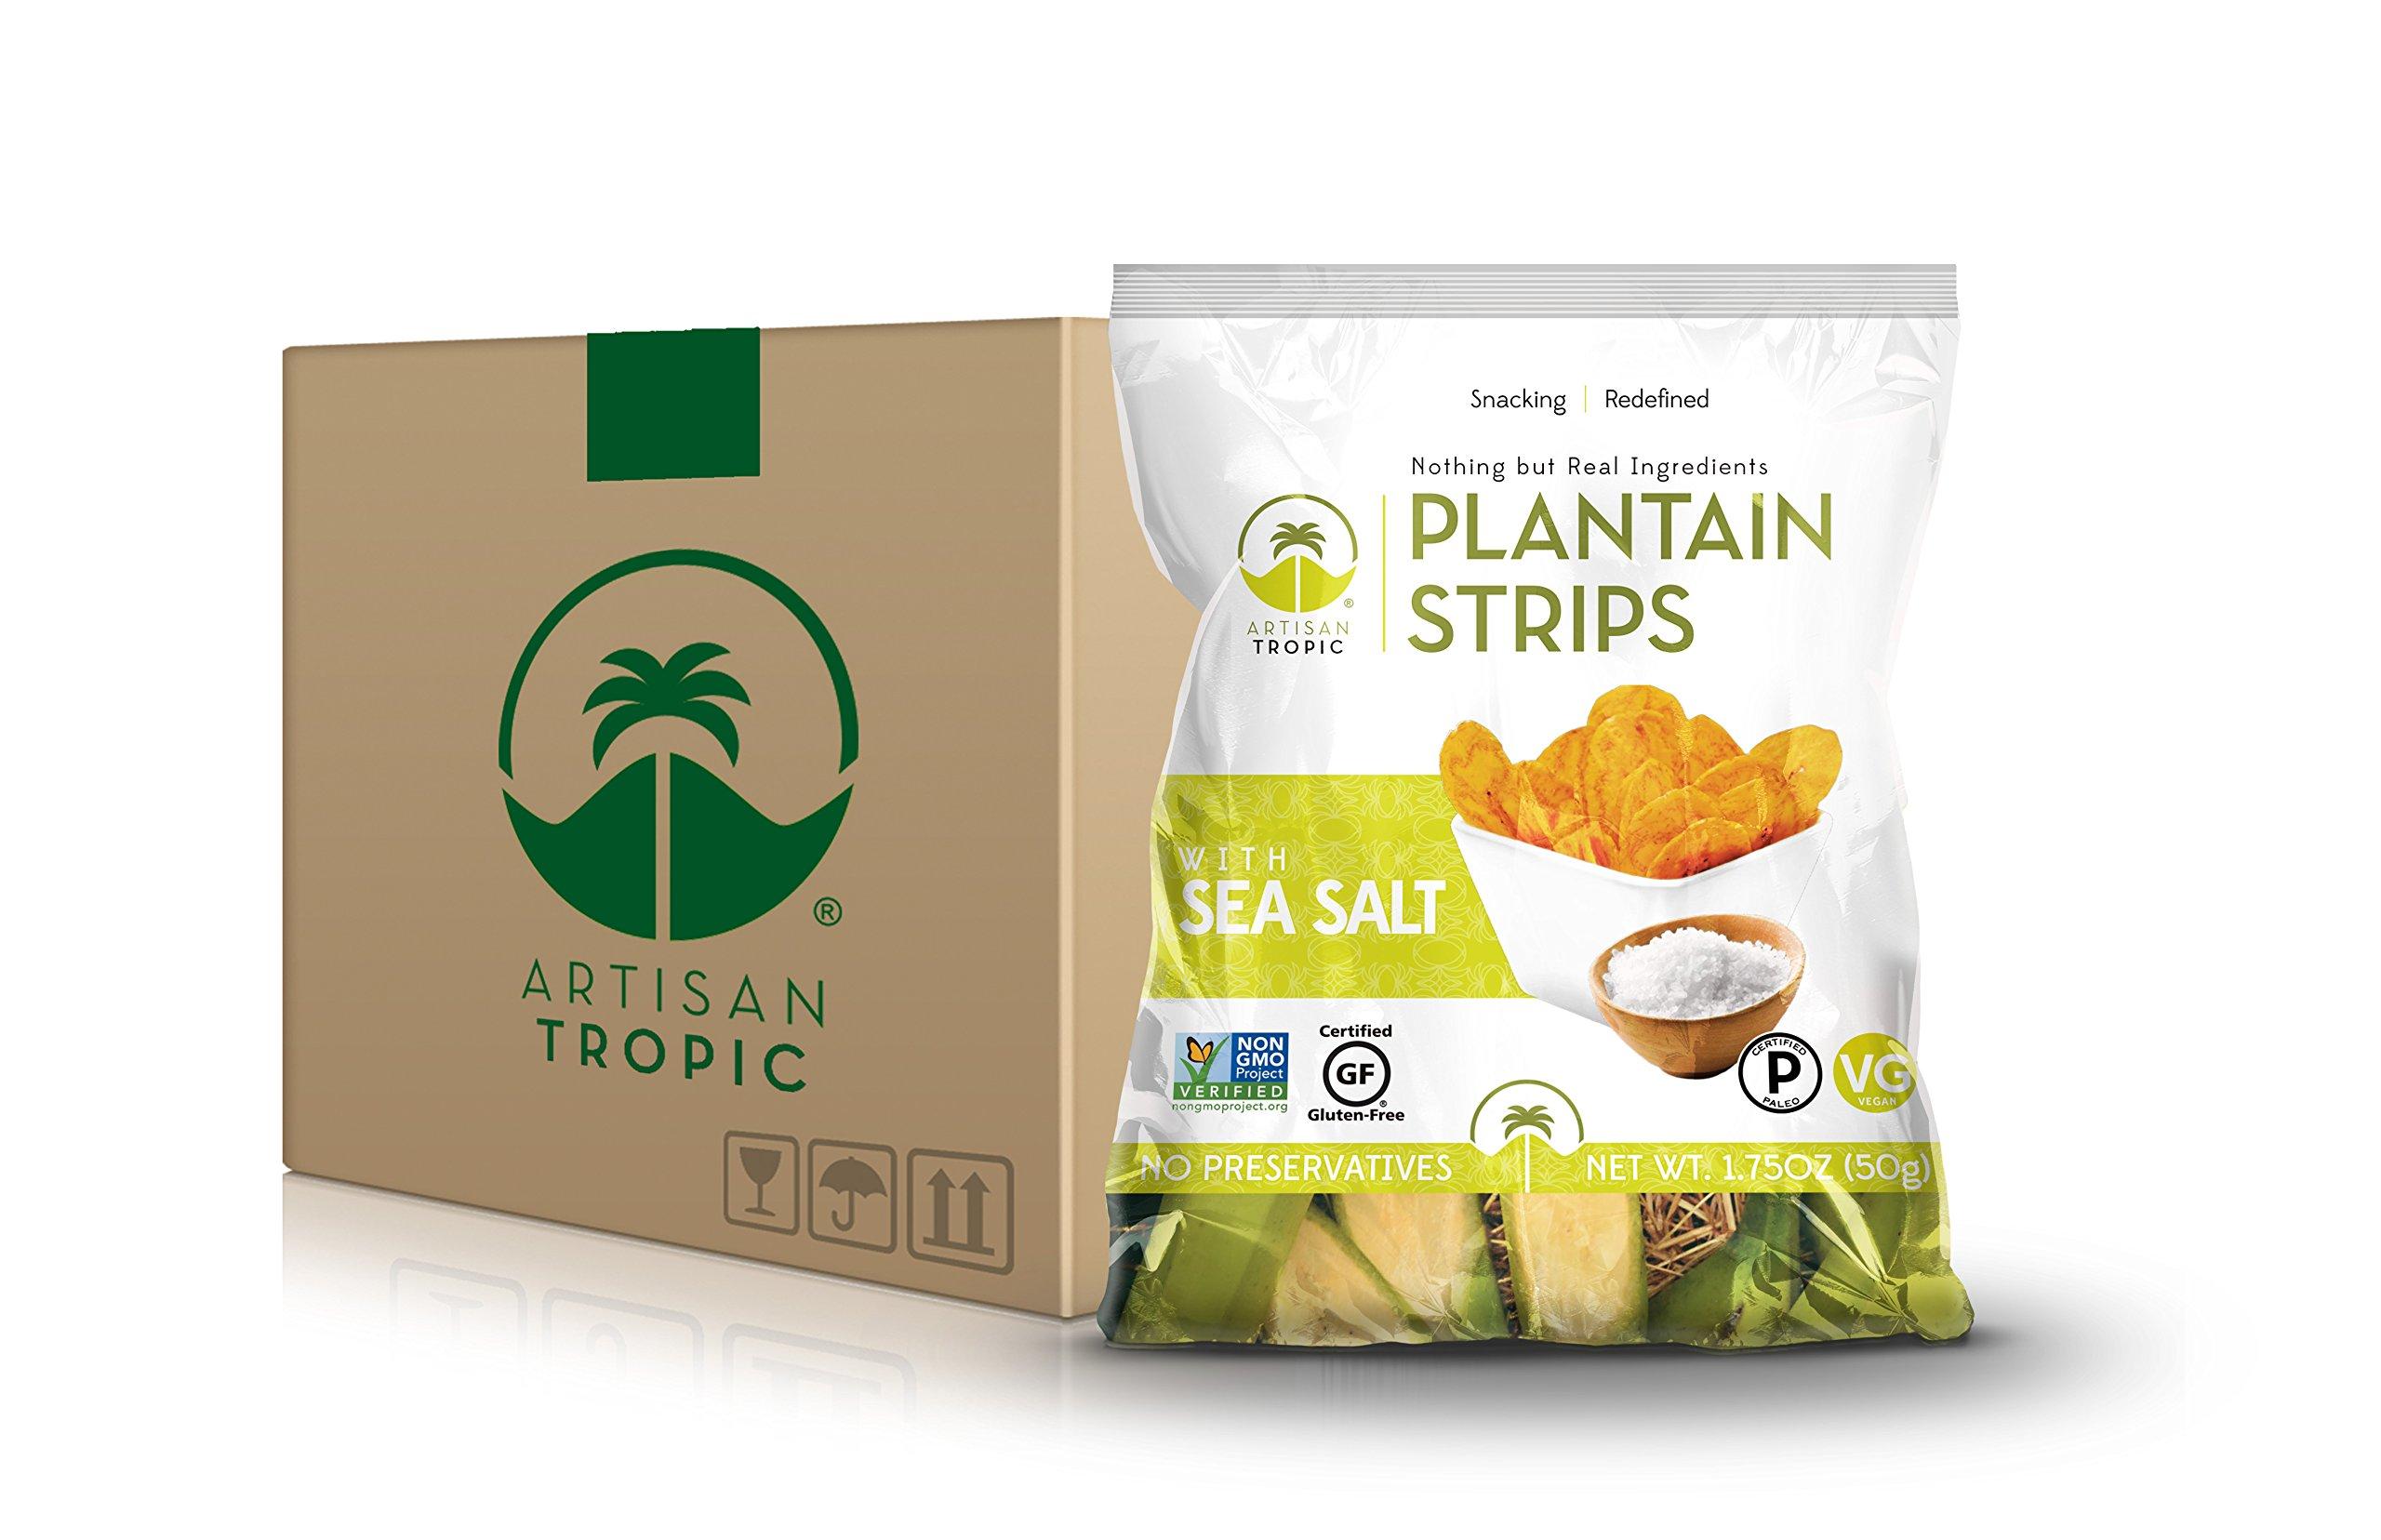 Artisan Tropic Plantain Strips: Sea Salt 1.75oz (16 pack) by Artisan Tropic (Image #1)